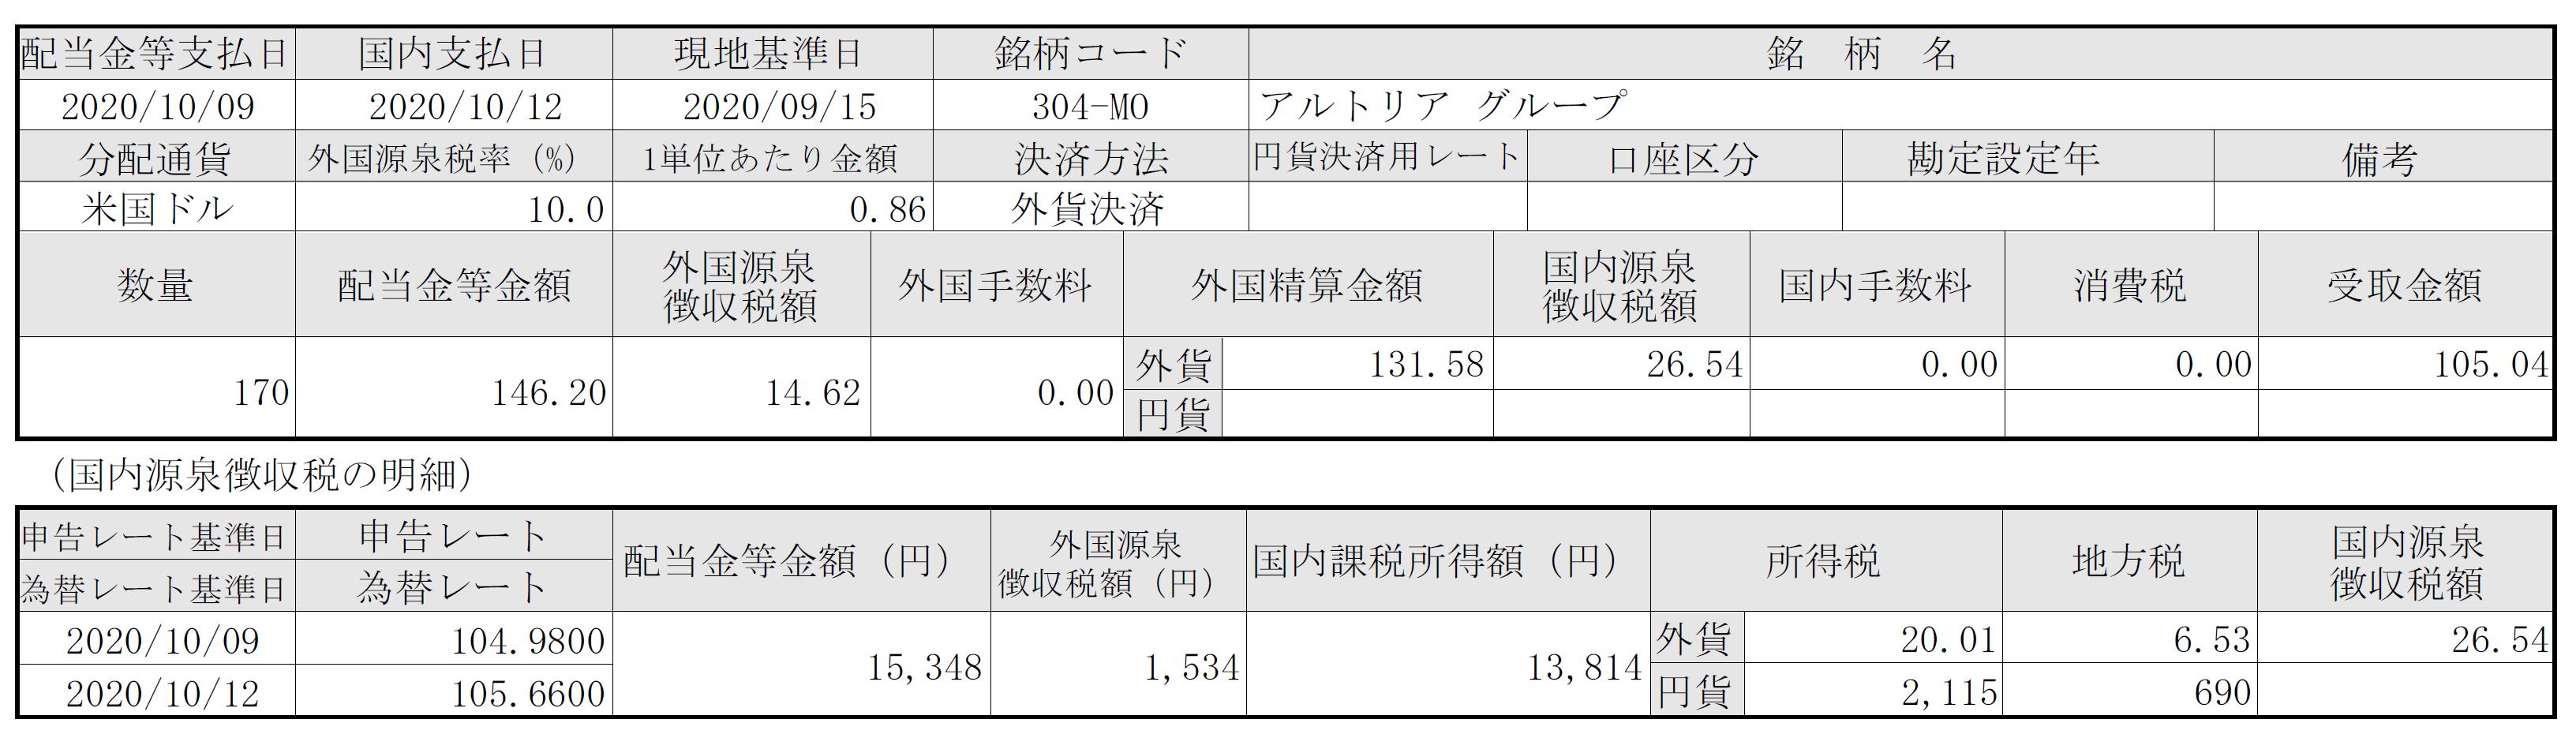 f:id:hodo-work:20201020132028p:plain